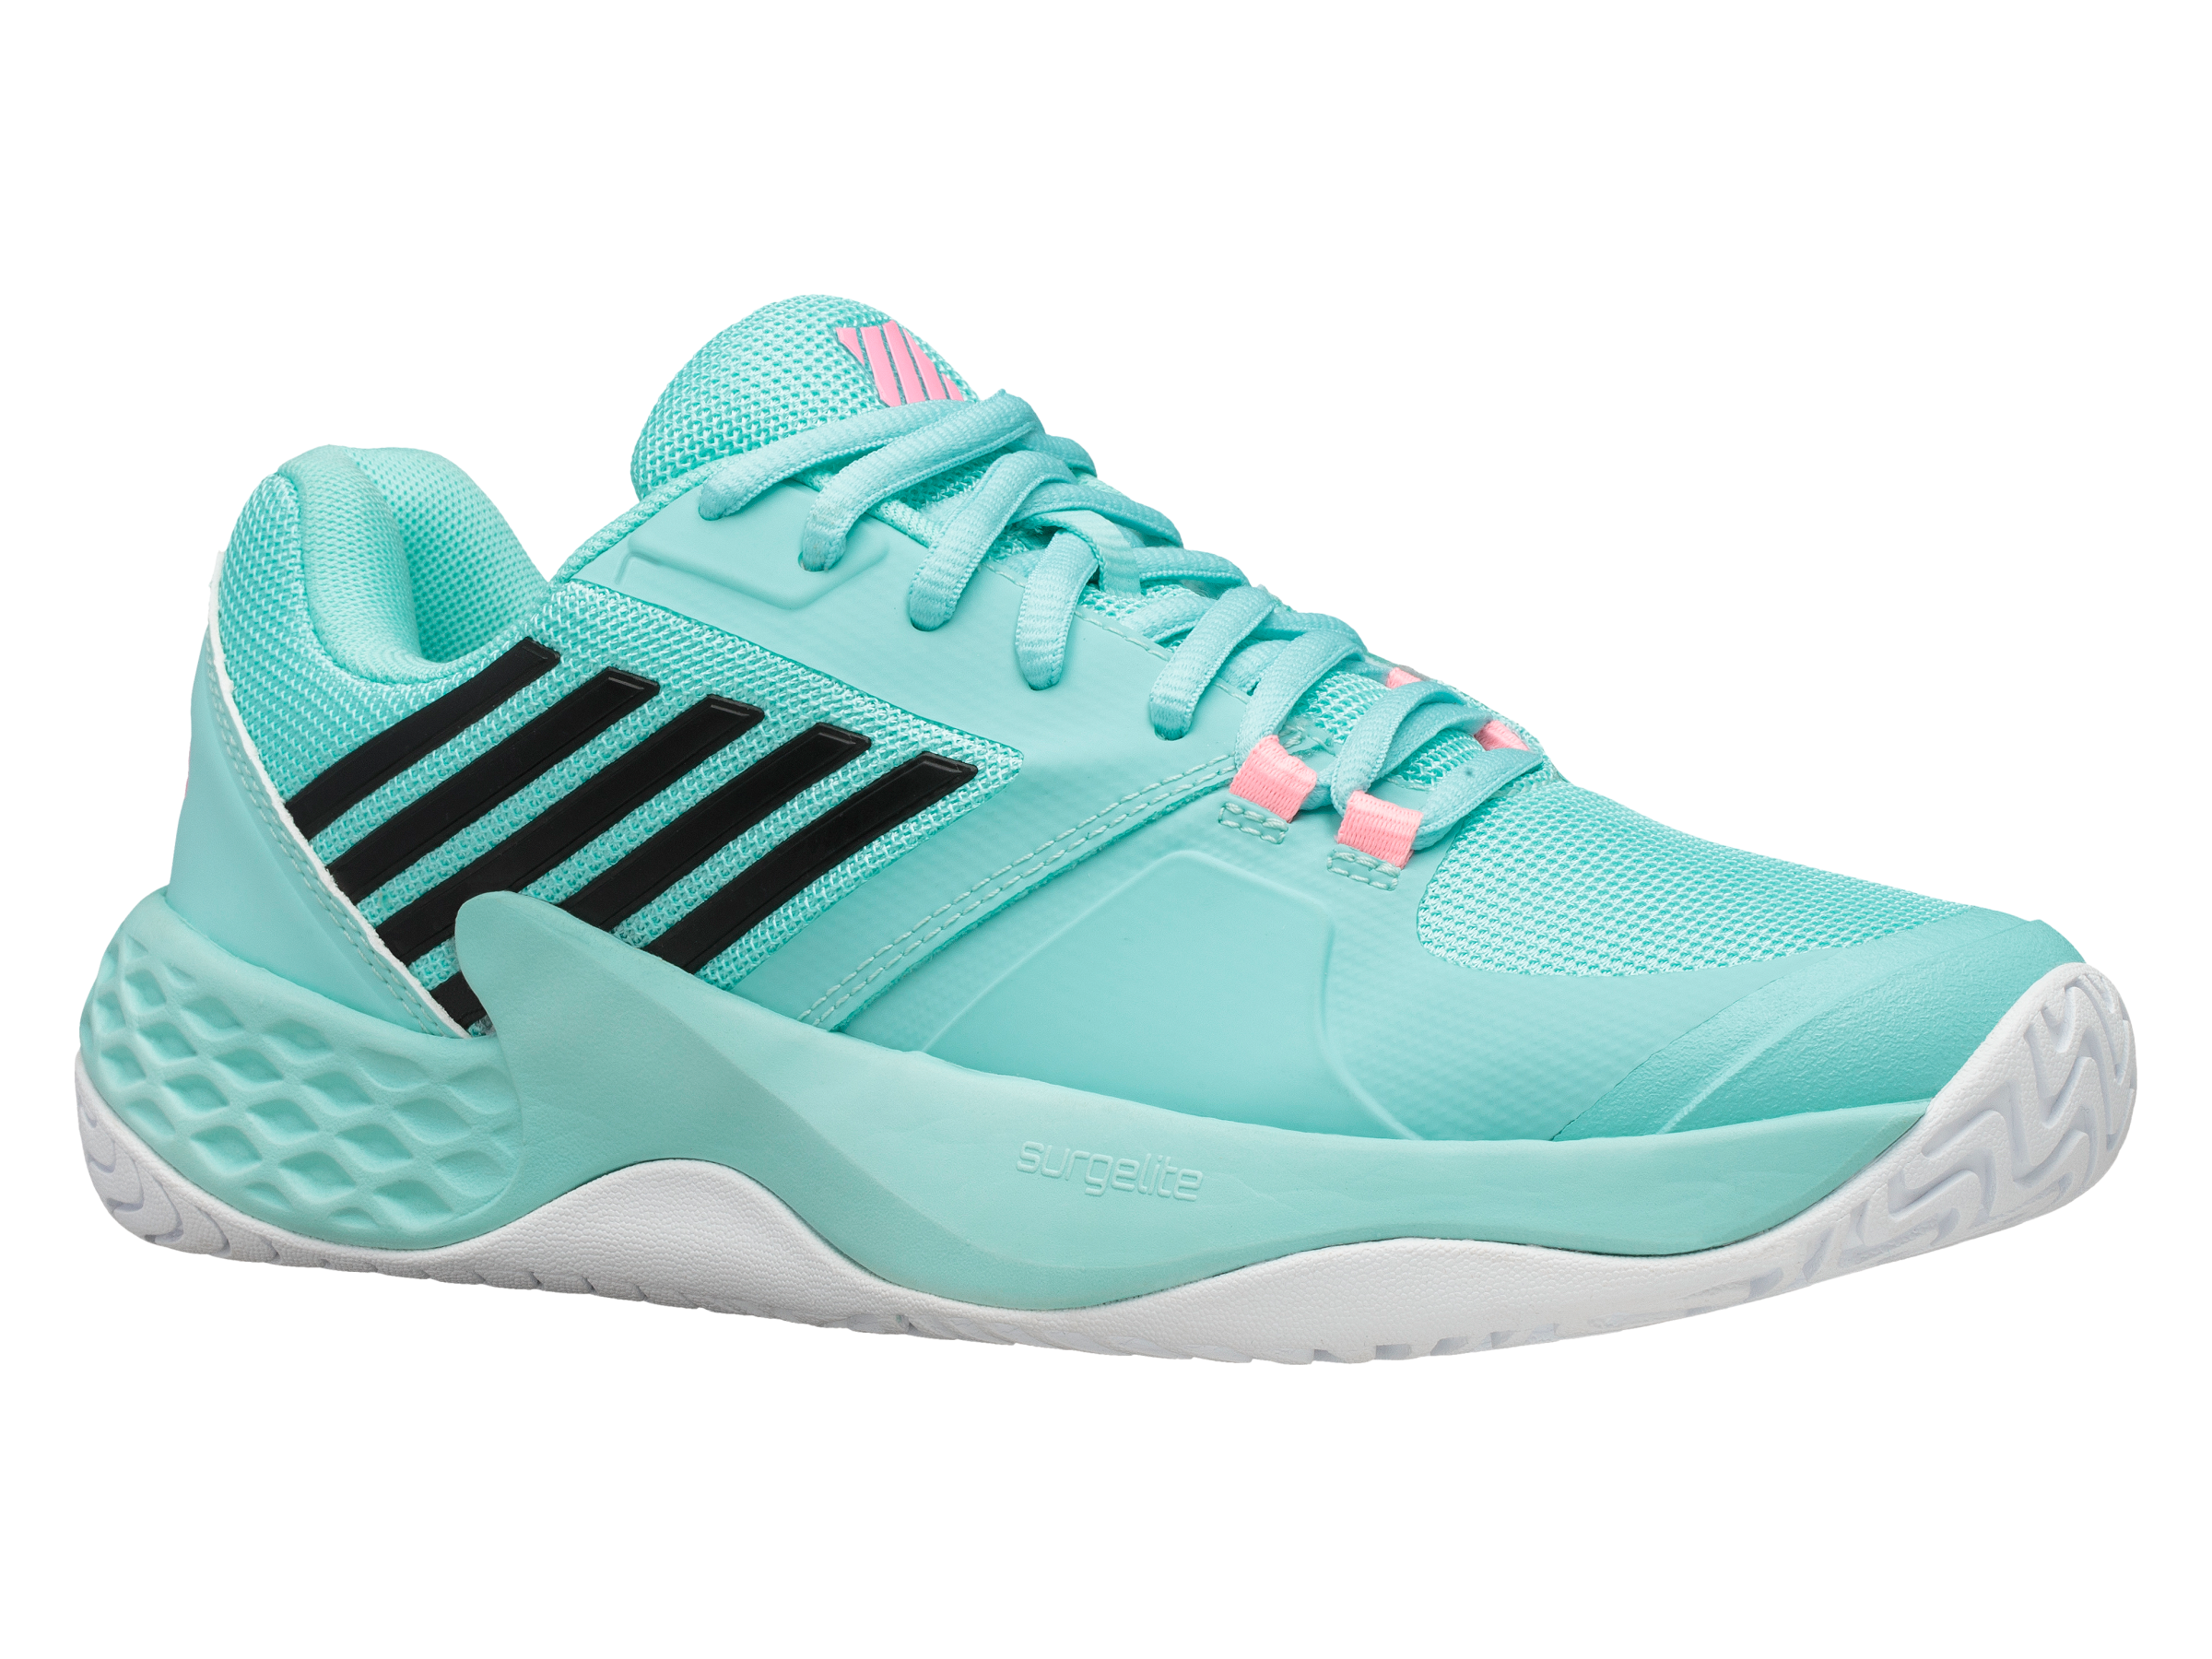 K-Swiss Aero Court Women's Tennis Shoes